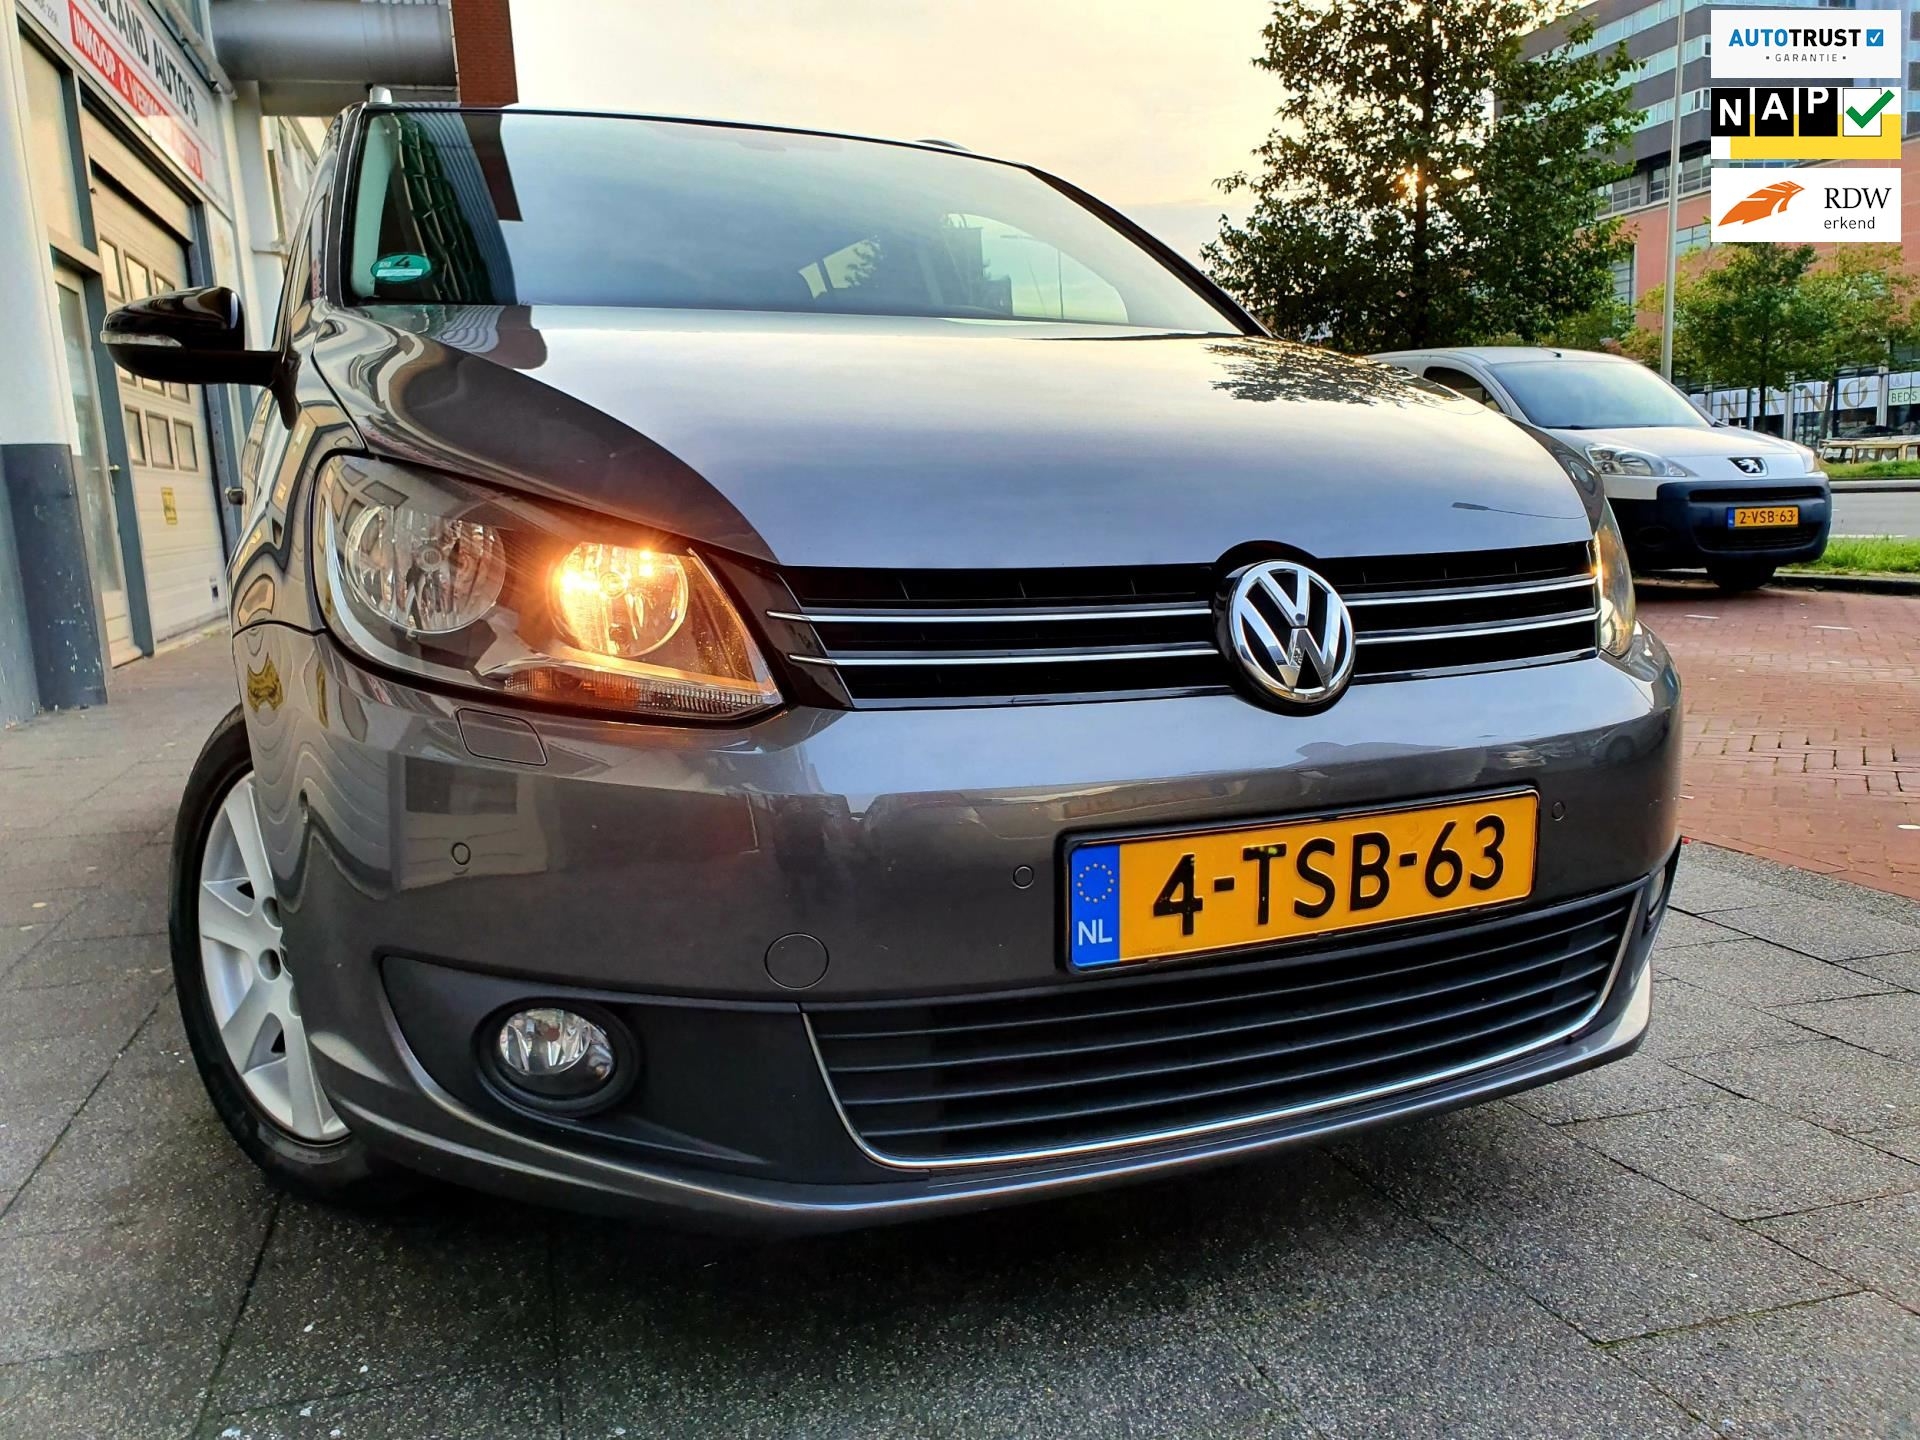 Volkswagen Touran occasion - Haagland Auto's